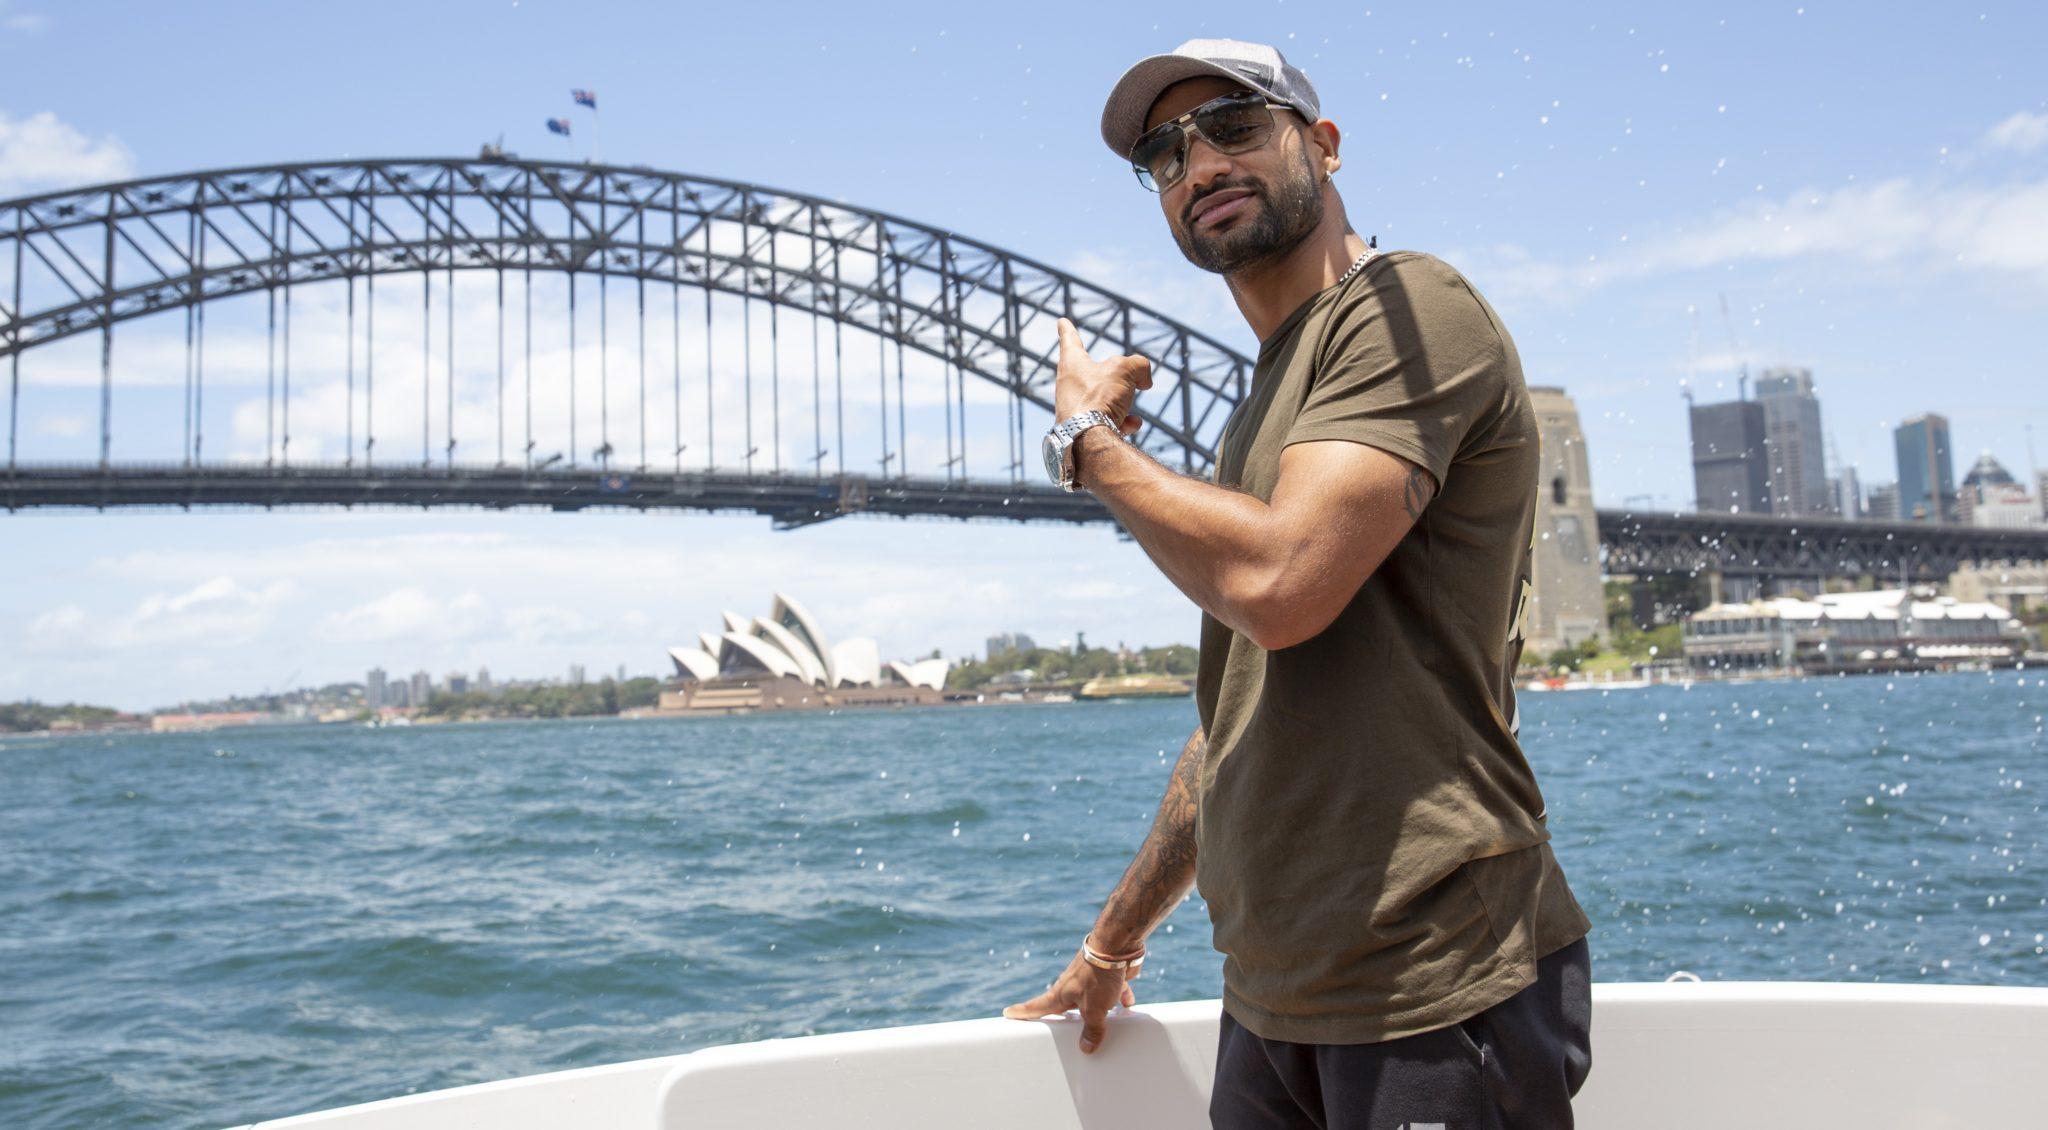 Shikhar Dhawan inspires Indians to UnDiscover Australia